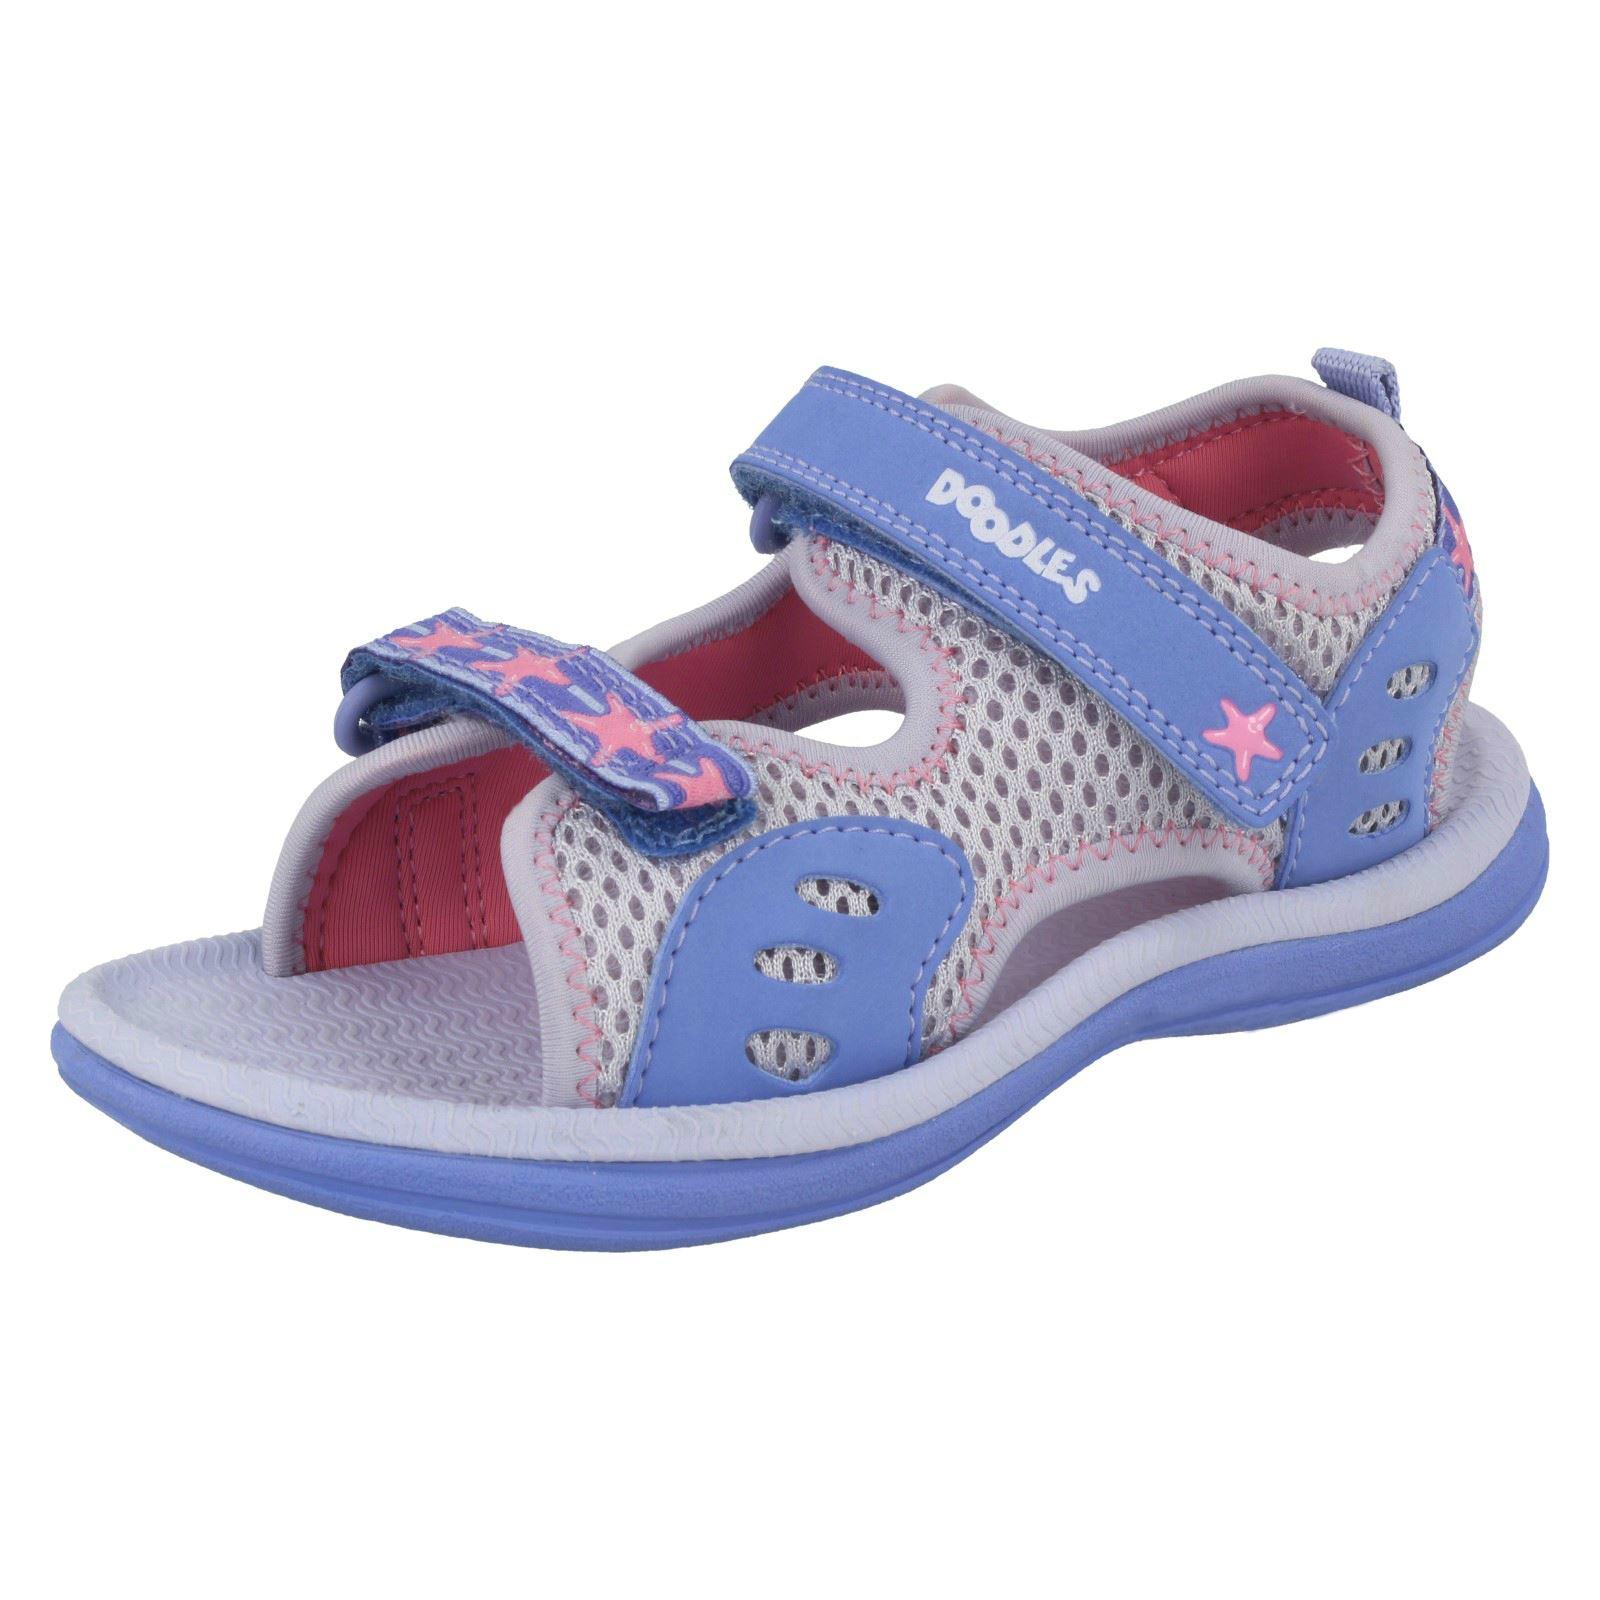 d33e5b1766f1 039-Clarks-Girls-039-Sandals-Star-Games thumbnail 3